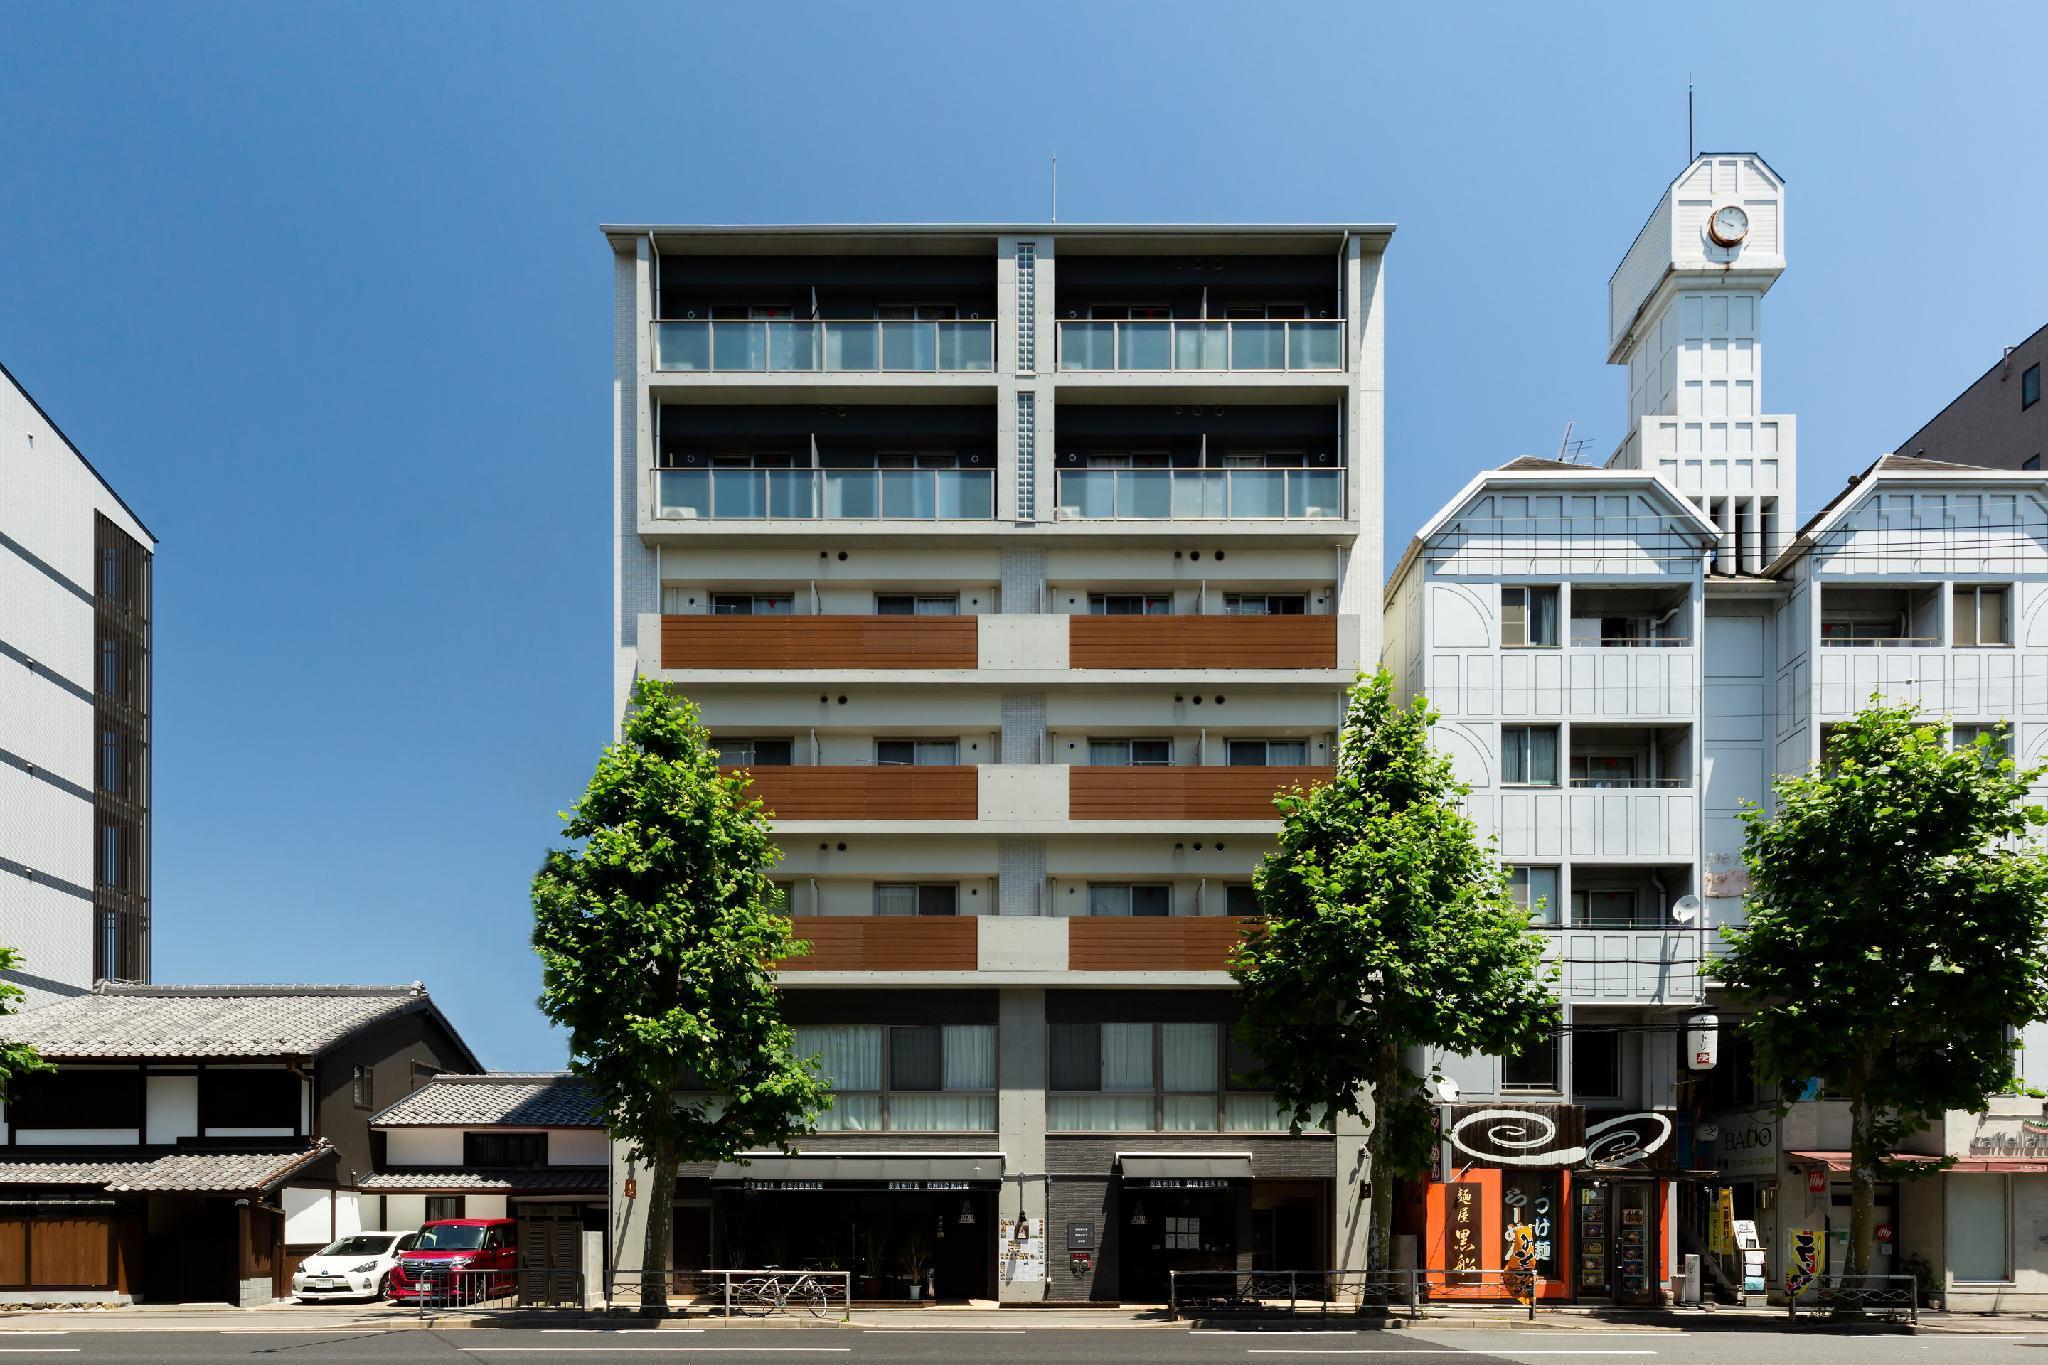 Japaning酒店 - 千久 JAPANING Senkyu